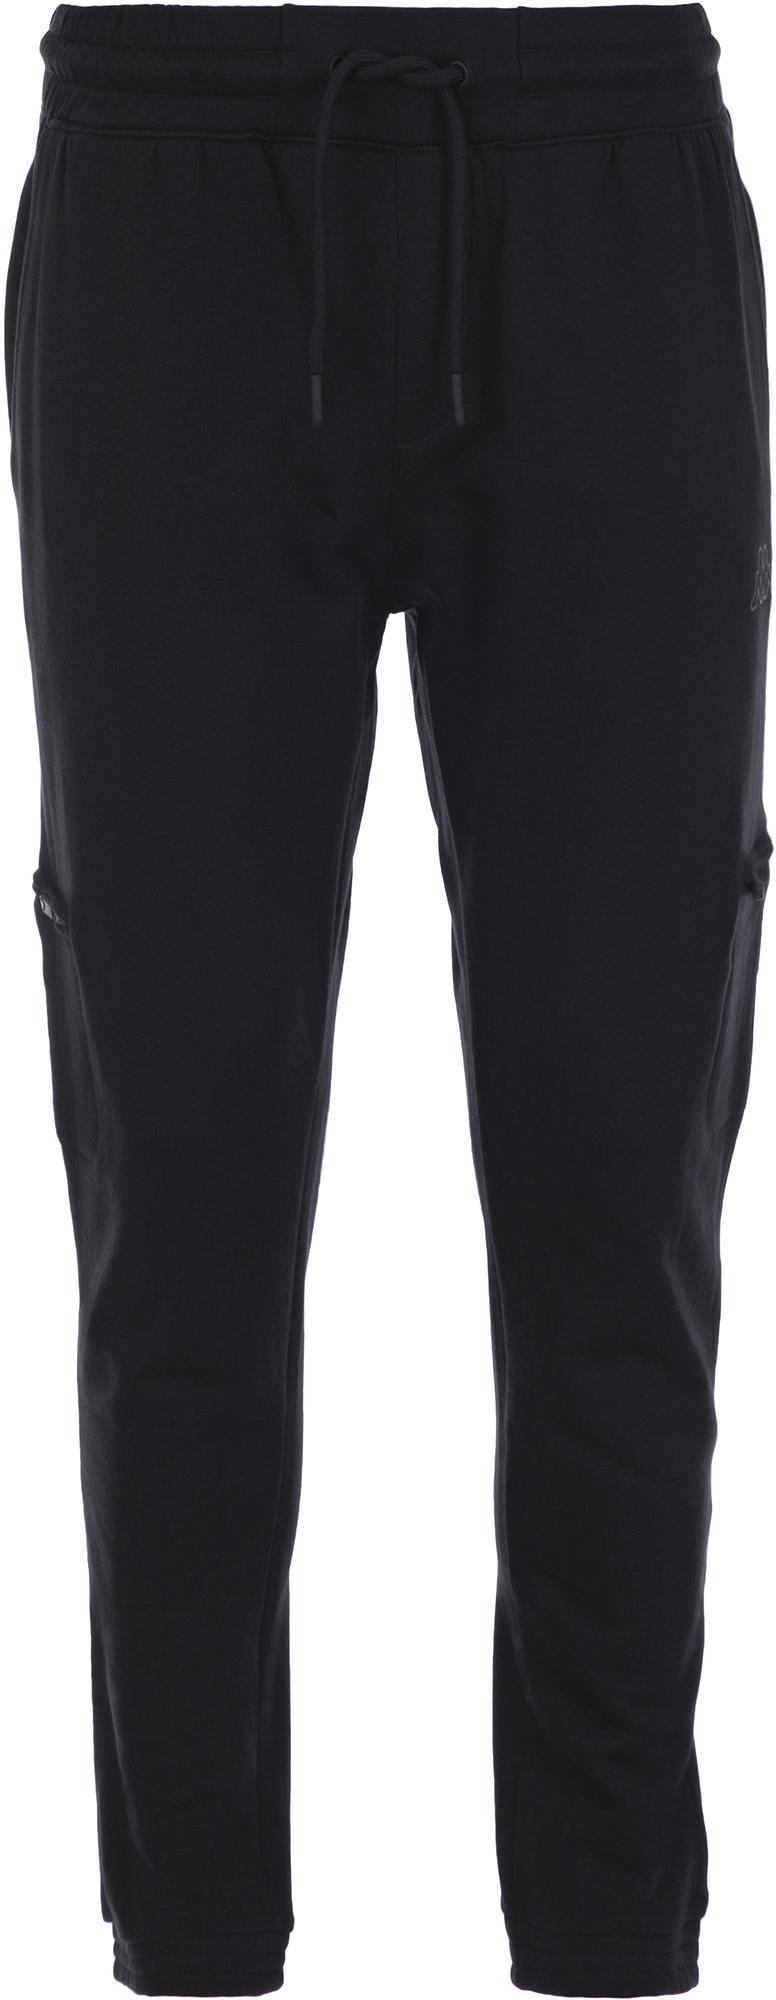 Kappa Брюки мужские Kappa, размер 54 брюки мужские sela цвет темно серый меланж pk 2415 012 8310 размер xxl 54